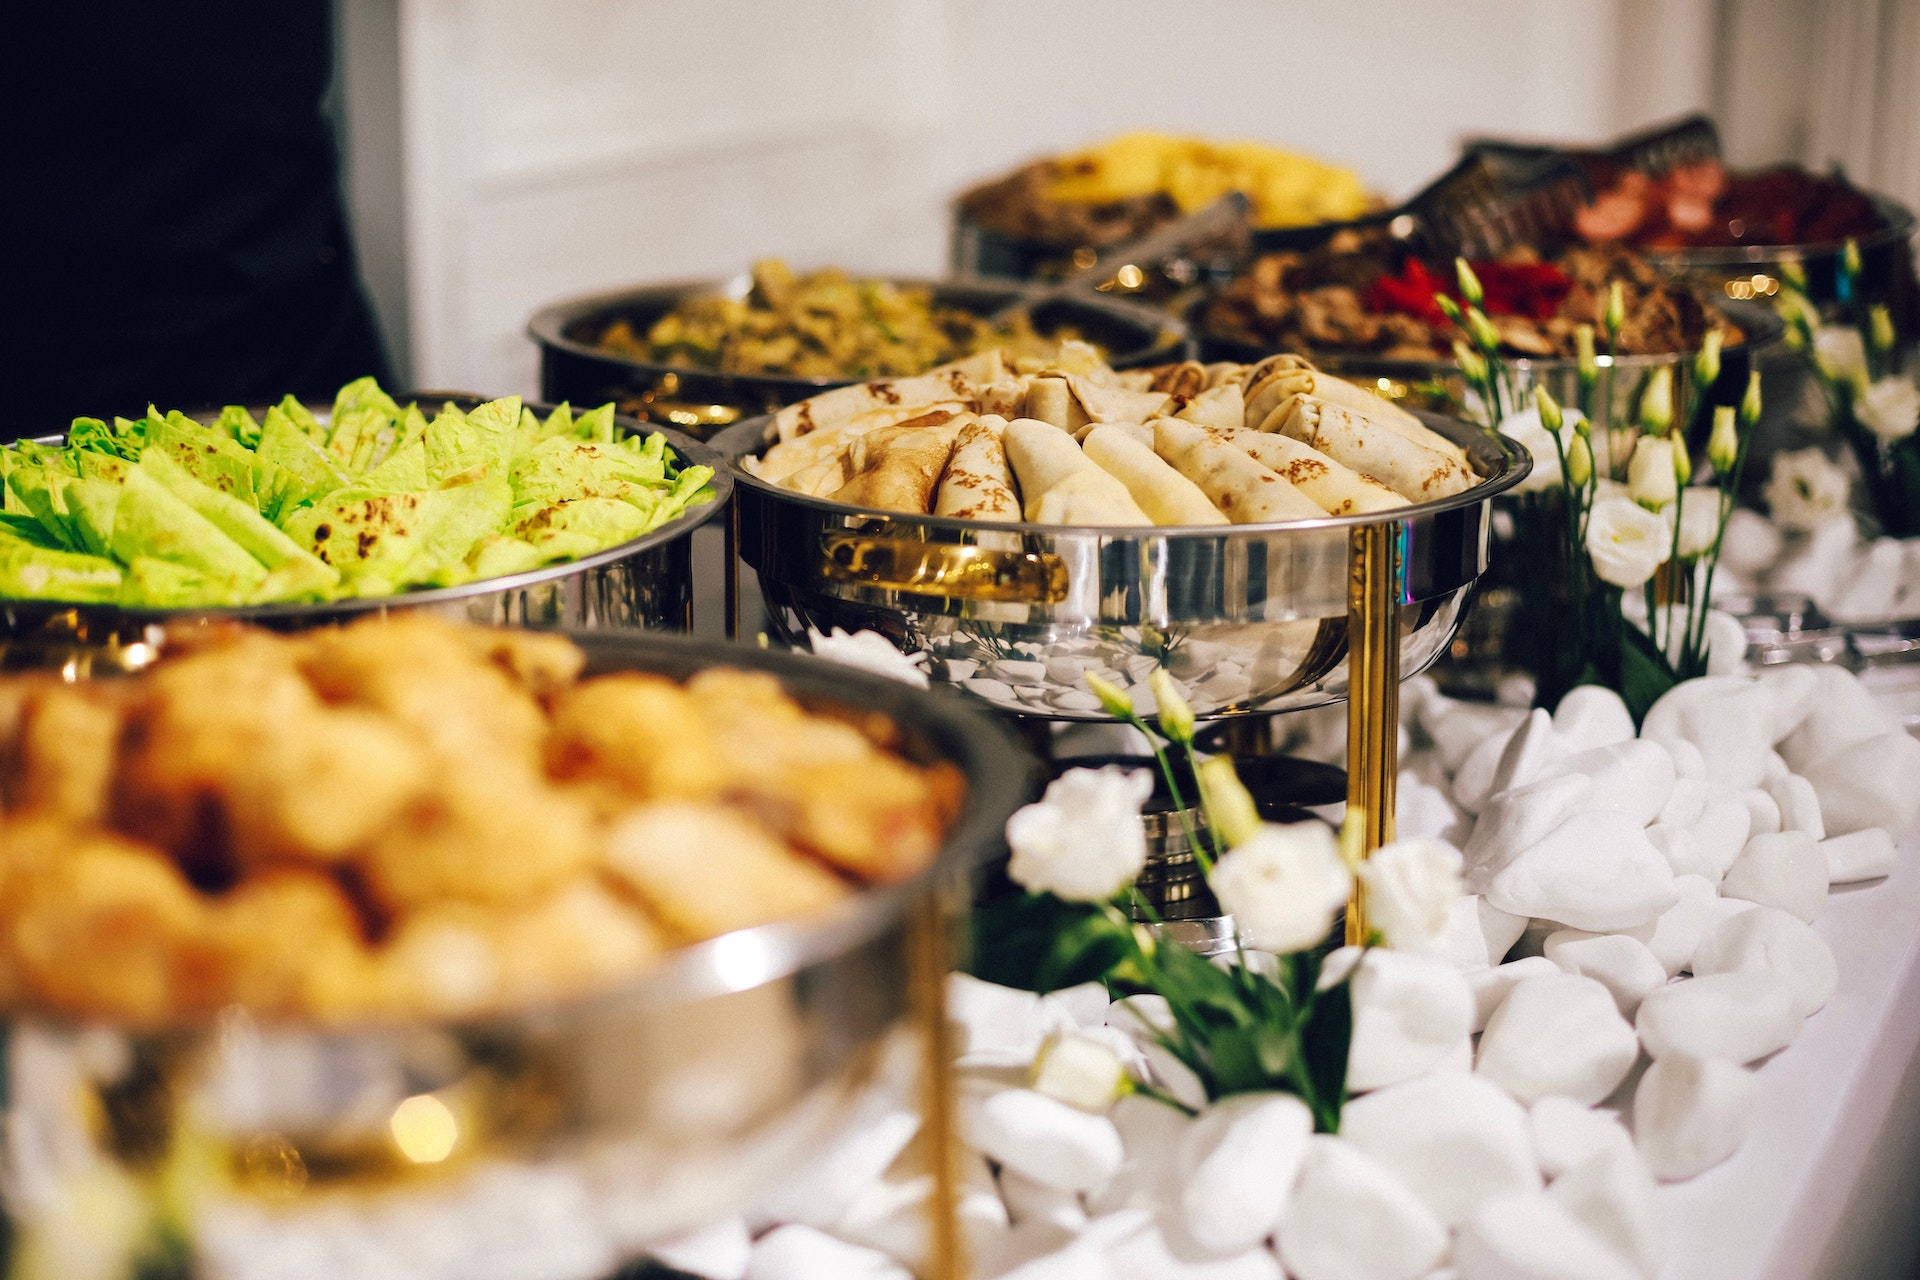 buffet-style-dinner-service